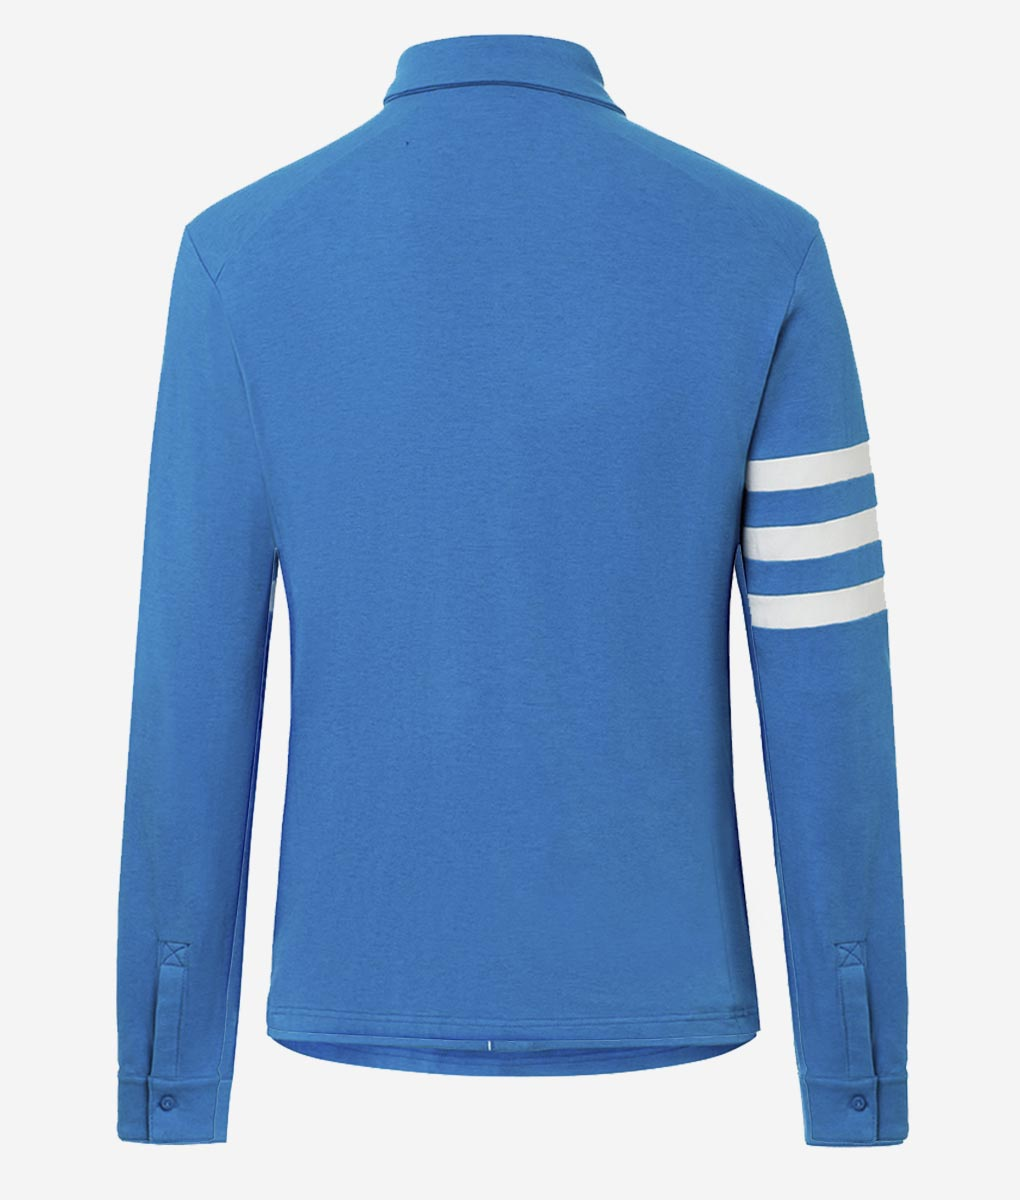 casual-cycling-transparent-Light- Blue-Merino-Shirt-back